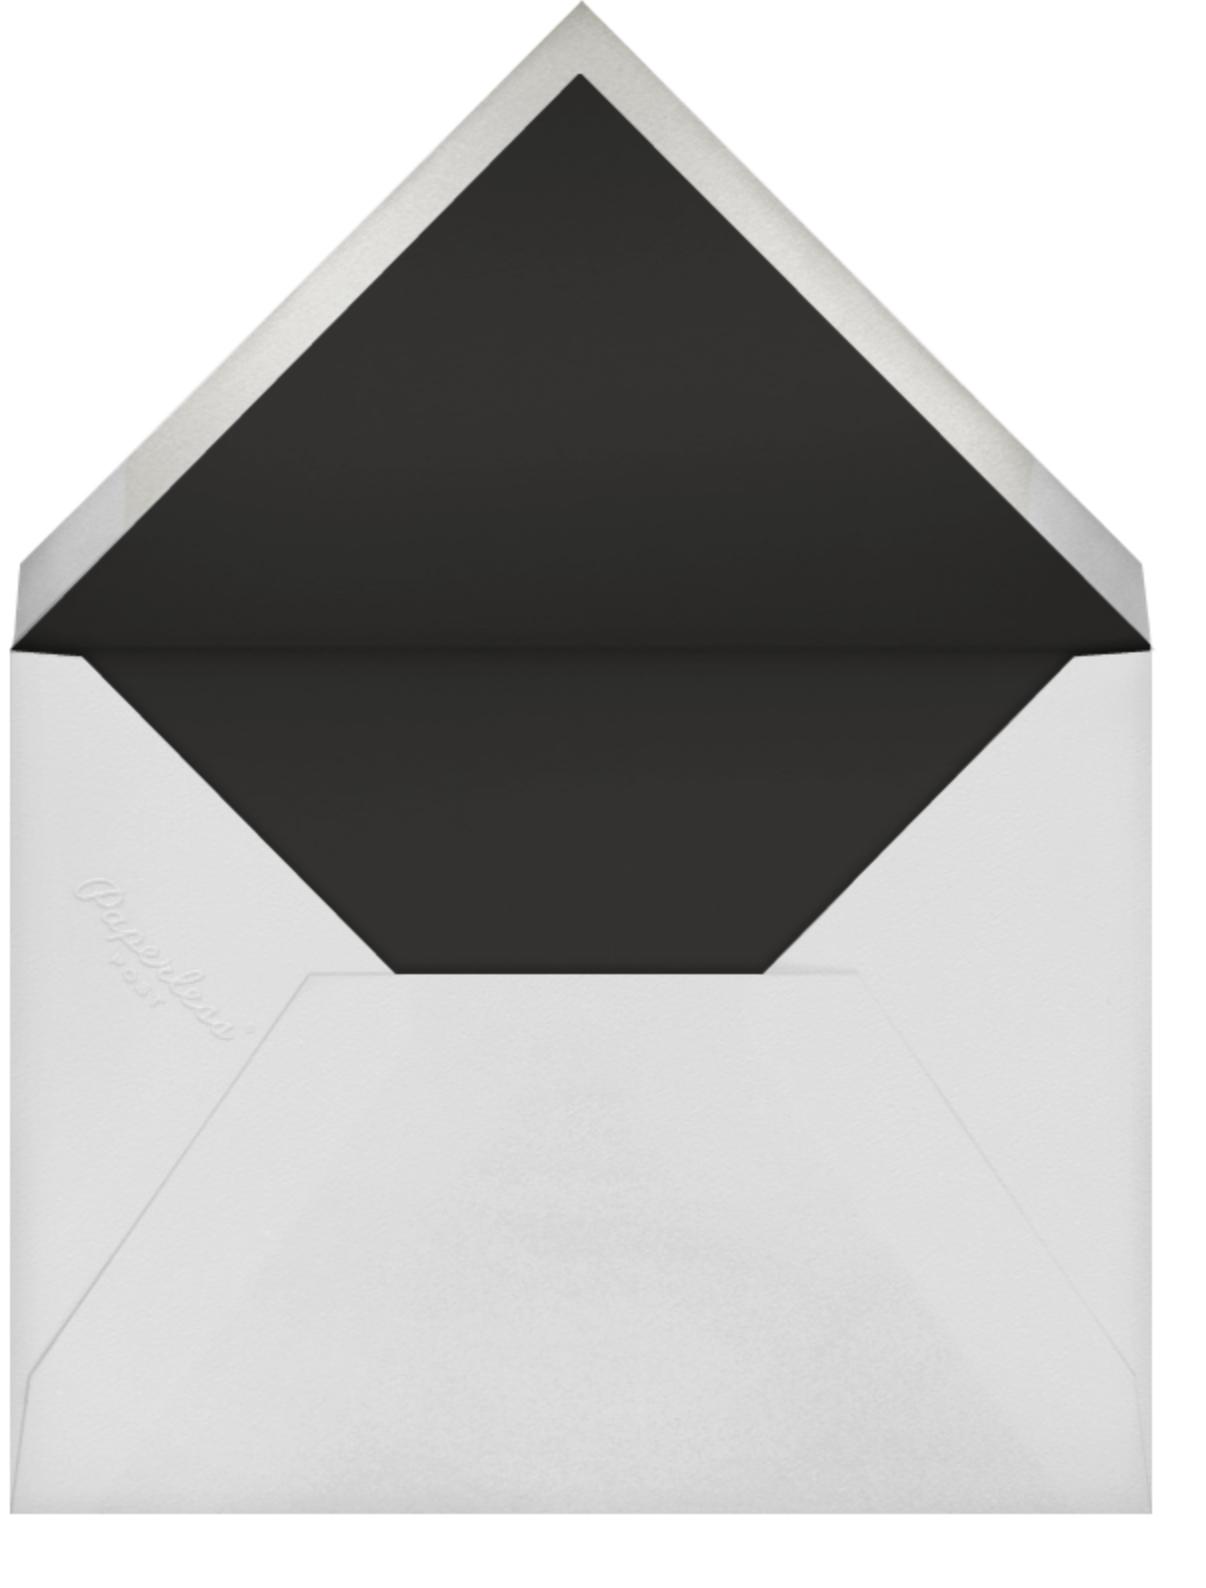 Richmond Park (Stationery) - White/Rose Gold - Oscar de la Renta - Envelope